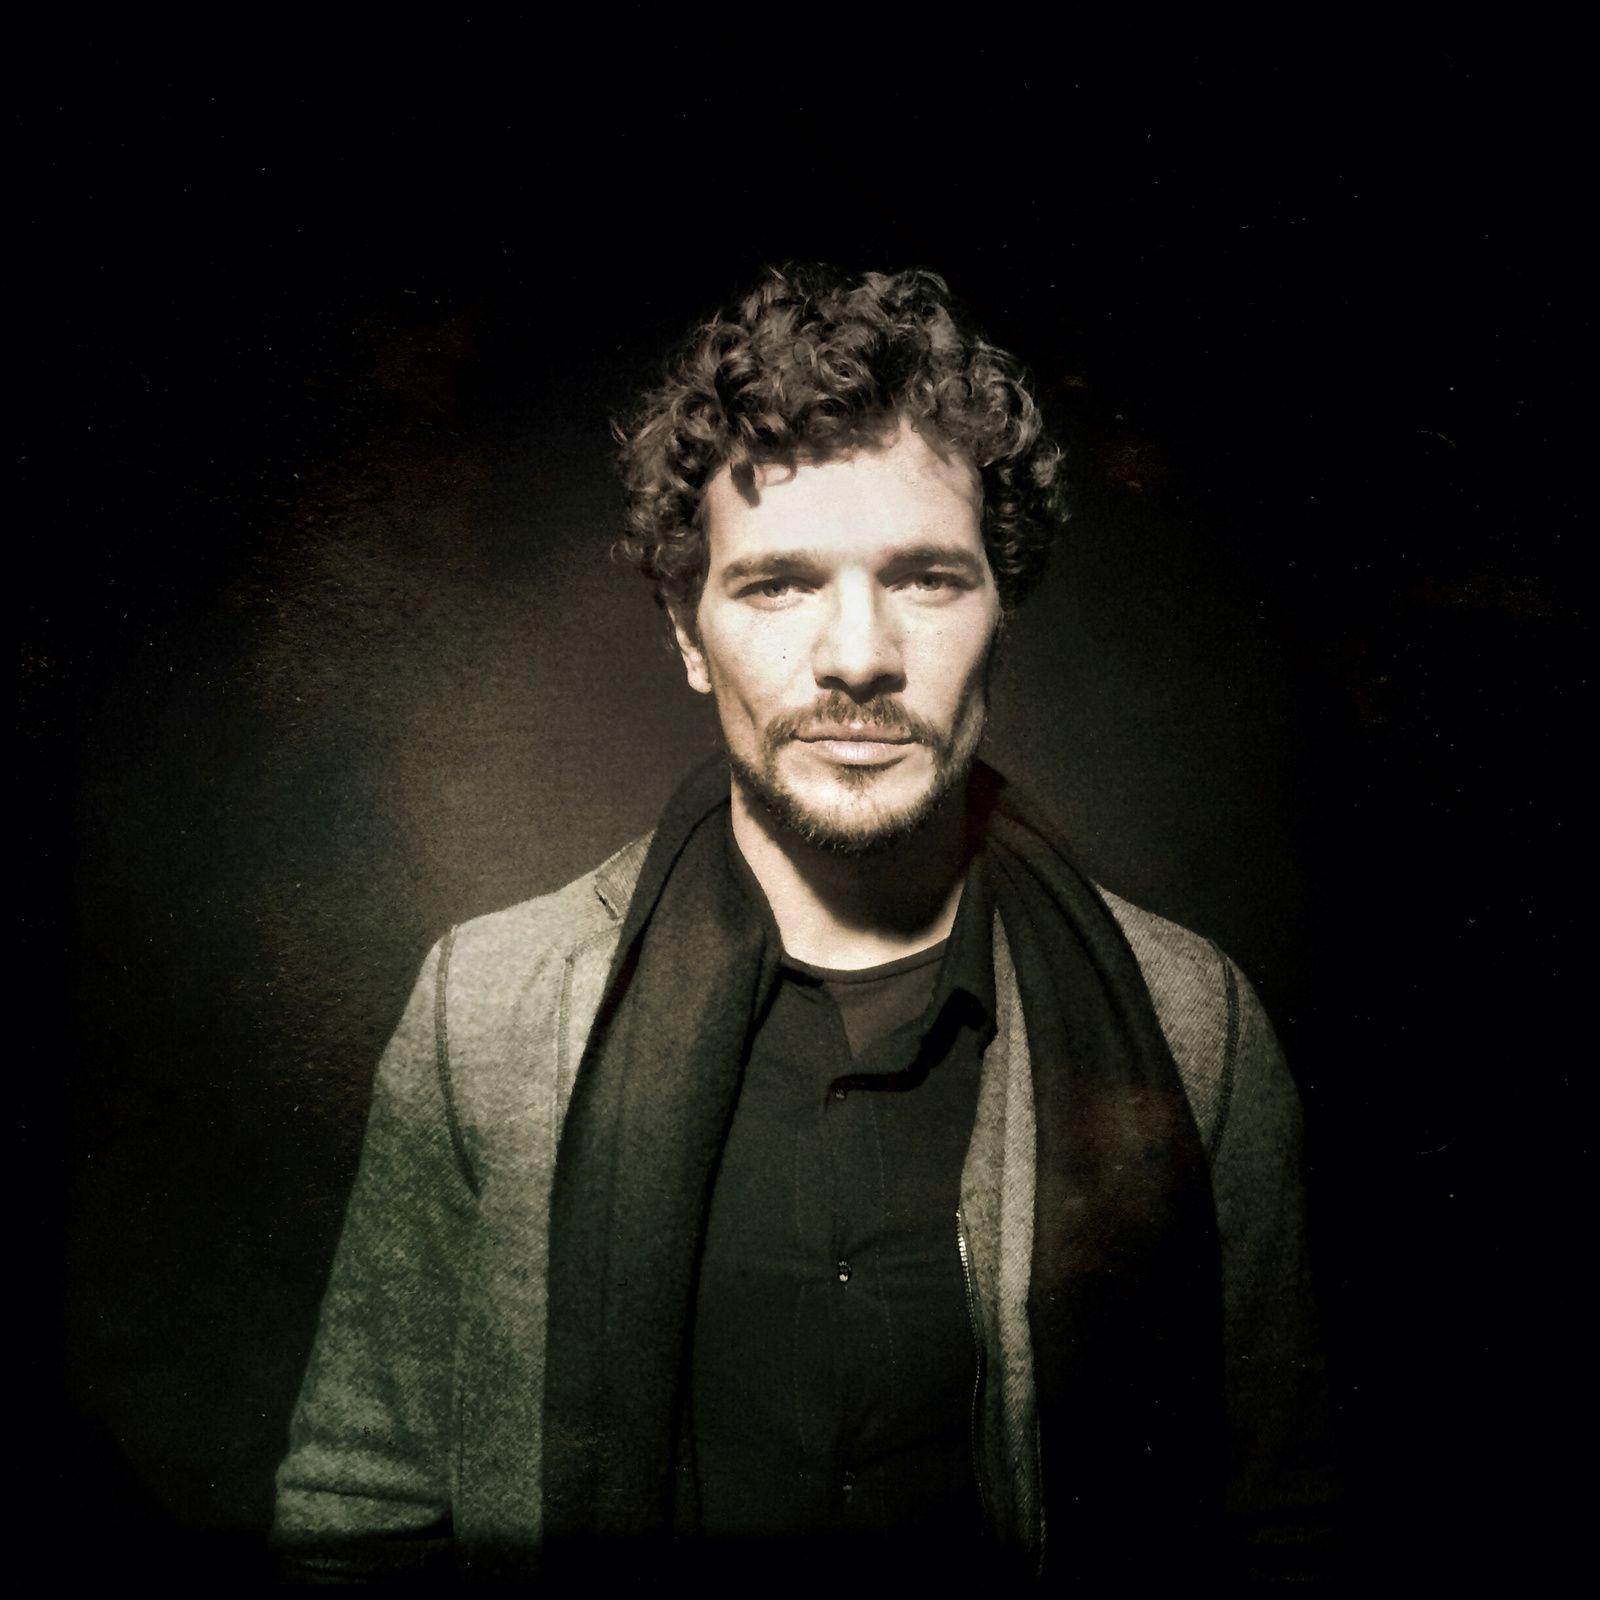 Daniel de Oliveira, ator brasileiro